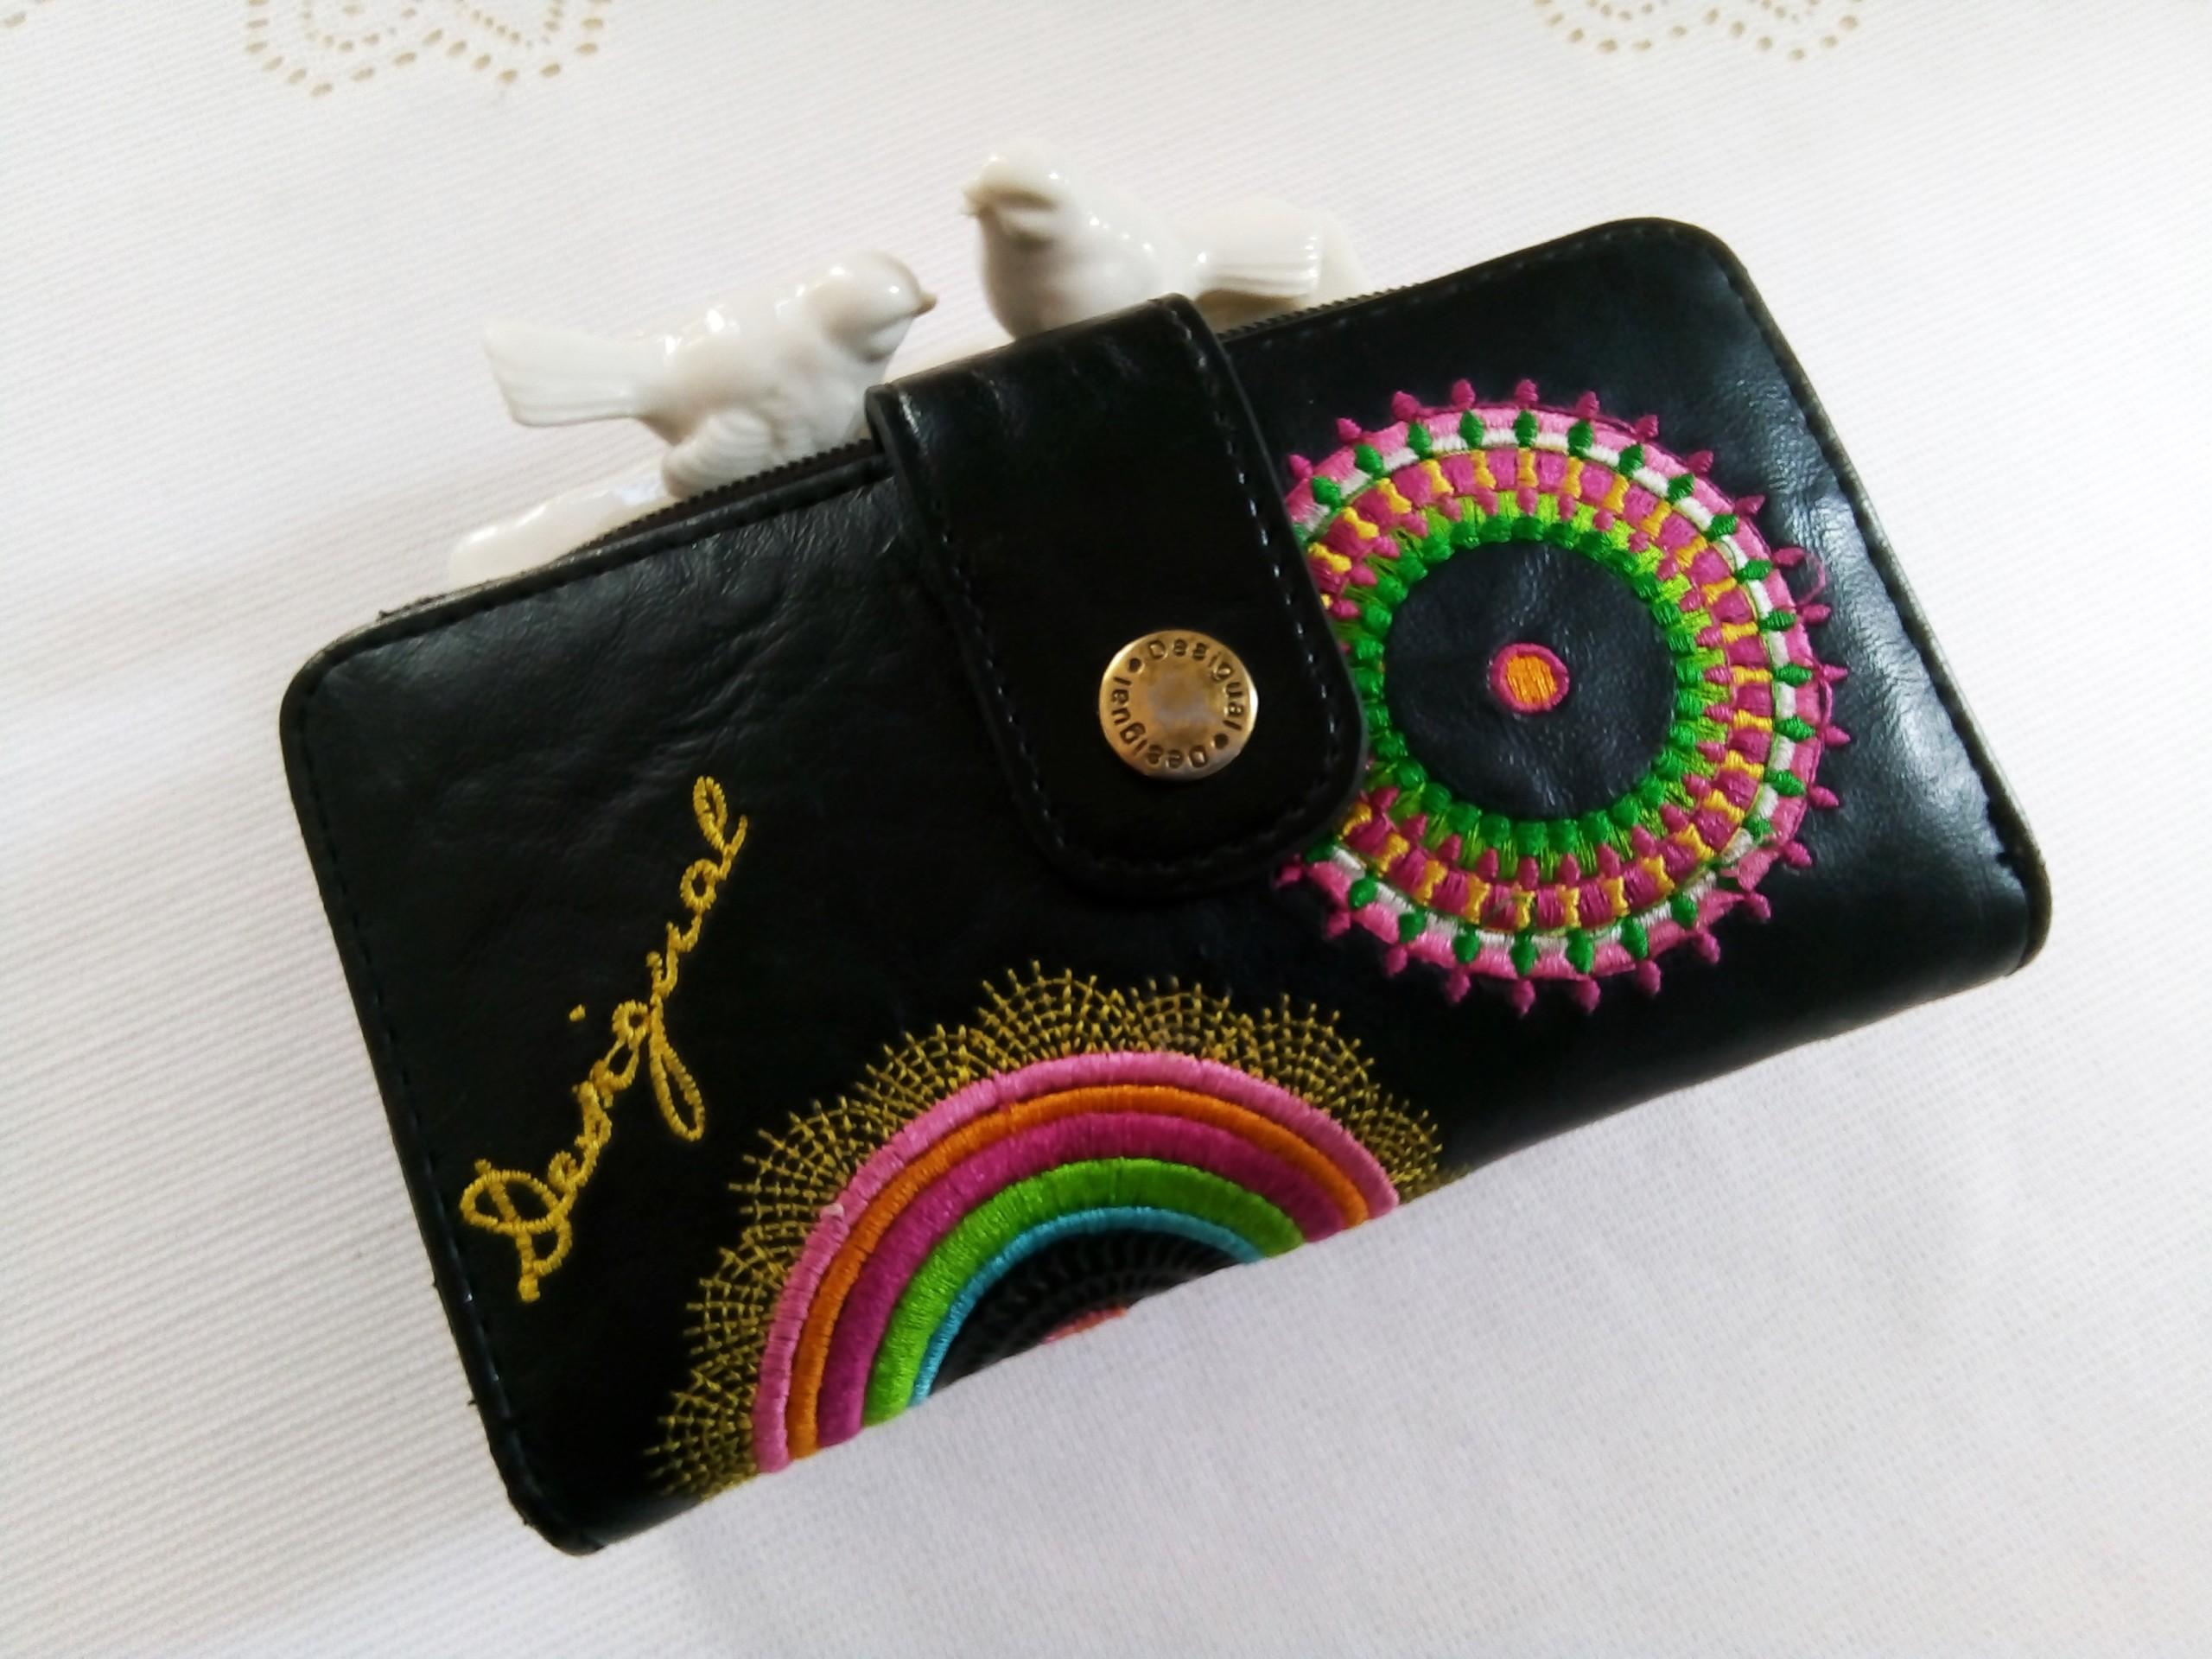 00e6a3978fe91 Desigual duży portfel damski Logo kolory - 7428841880 - oficjalne ...